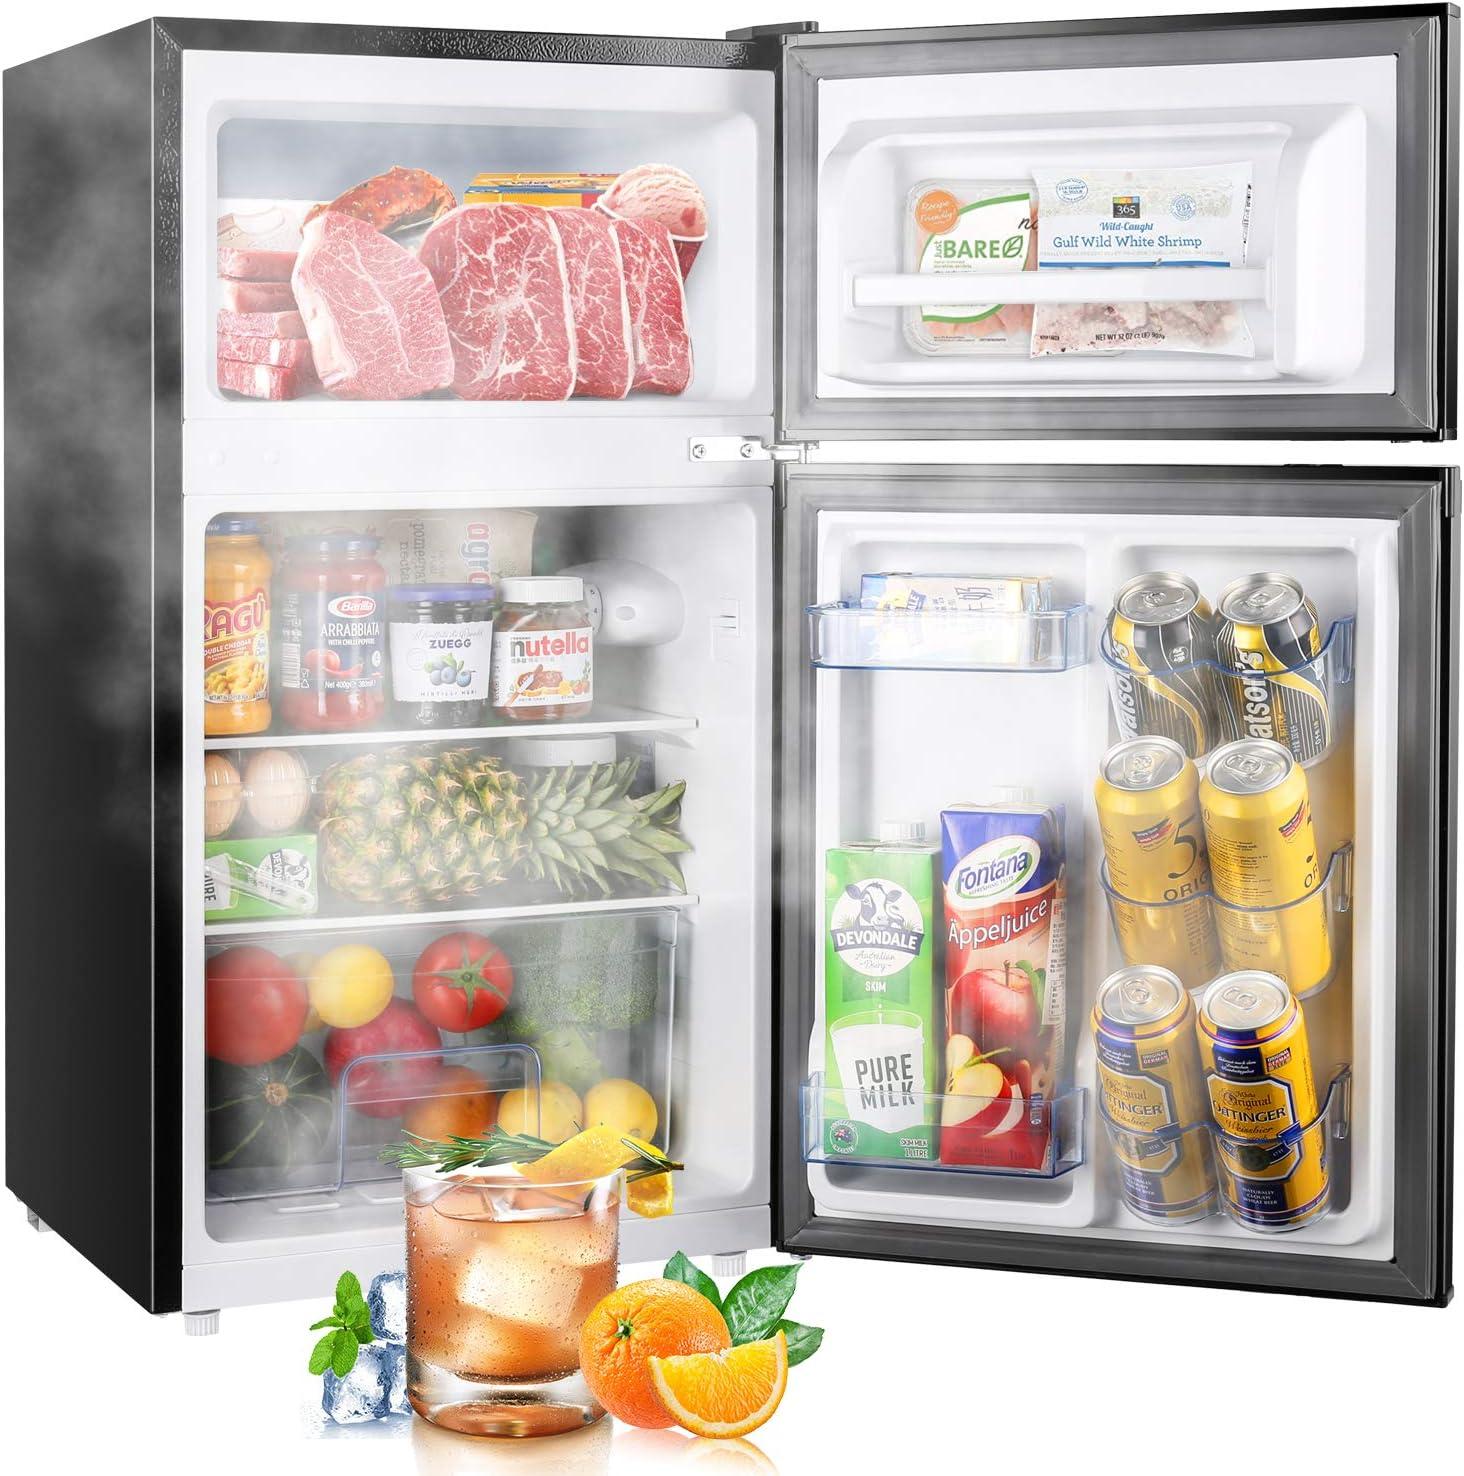 TECCPO Mini Fridge with Freezer TAMF34, 3.0 Cu.Ft. 2 Reversible Door Mini Fridge, 7 Adjustable Thermostat Control, Energy Star, Dorm Refrigerator